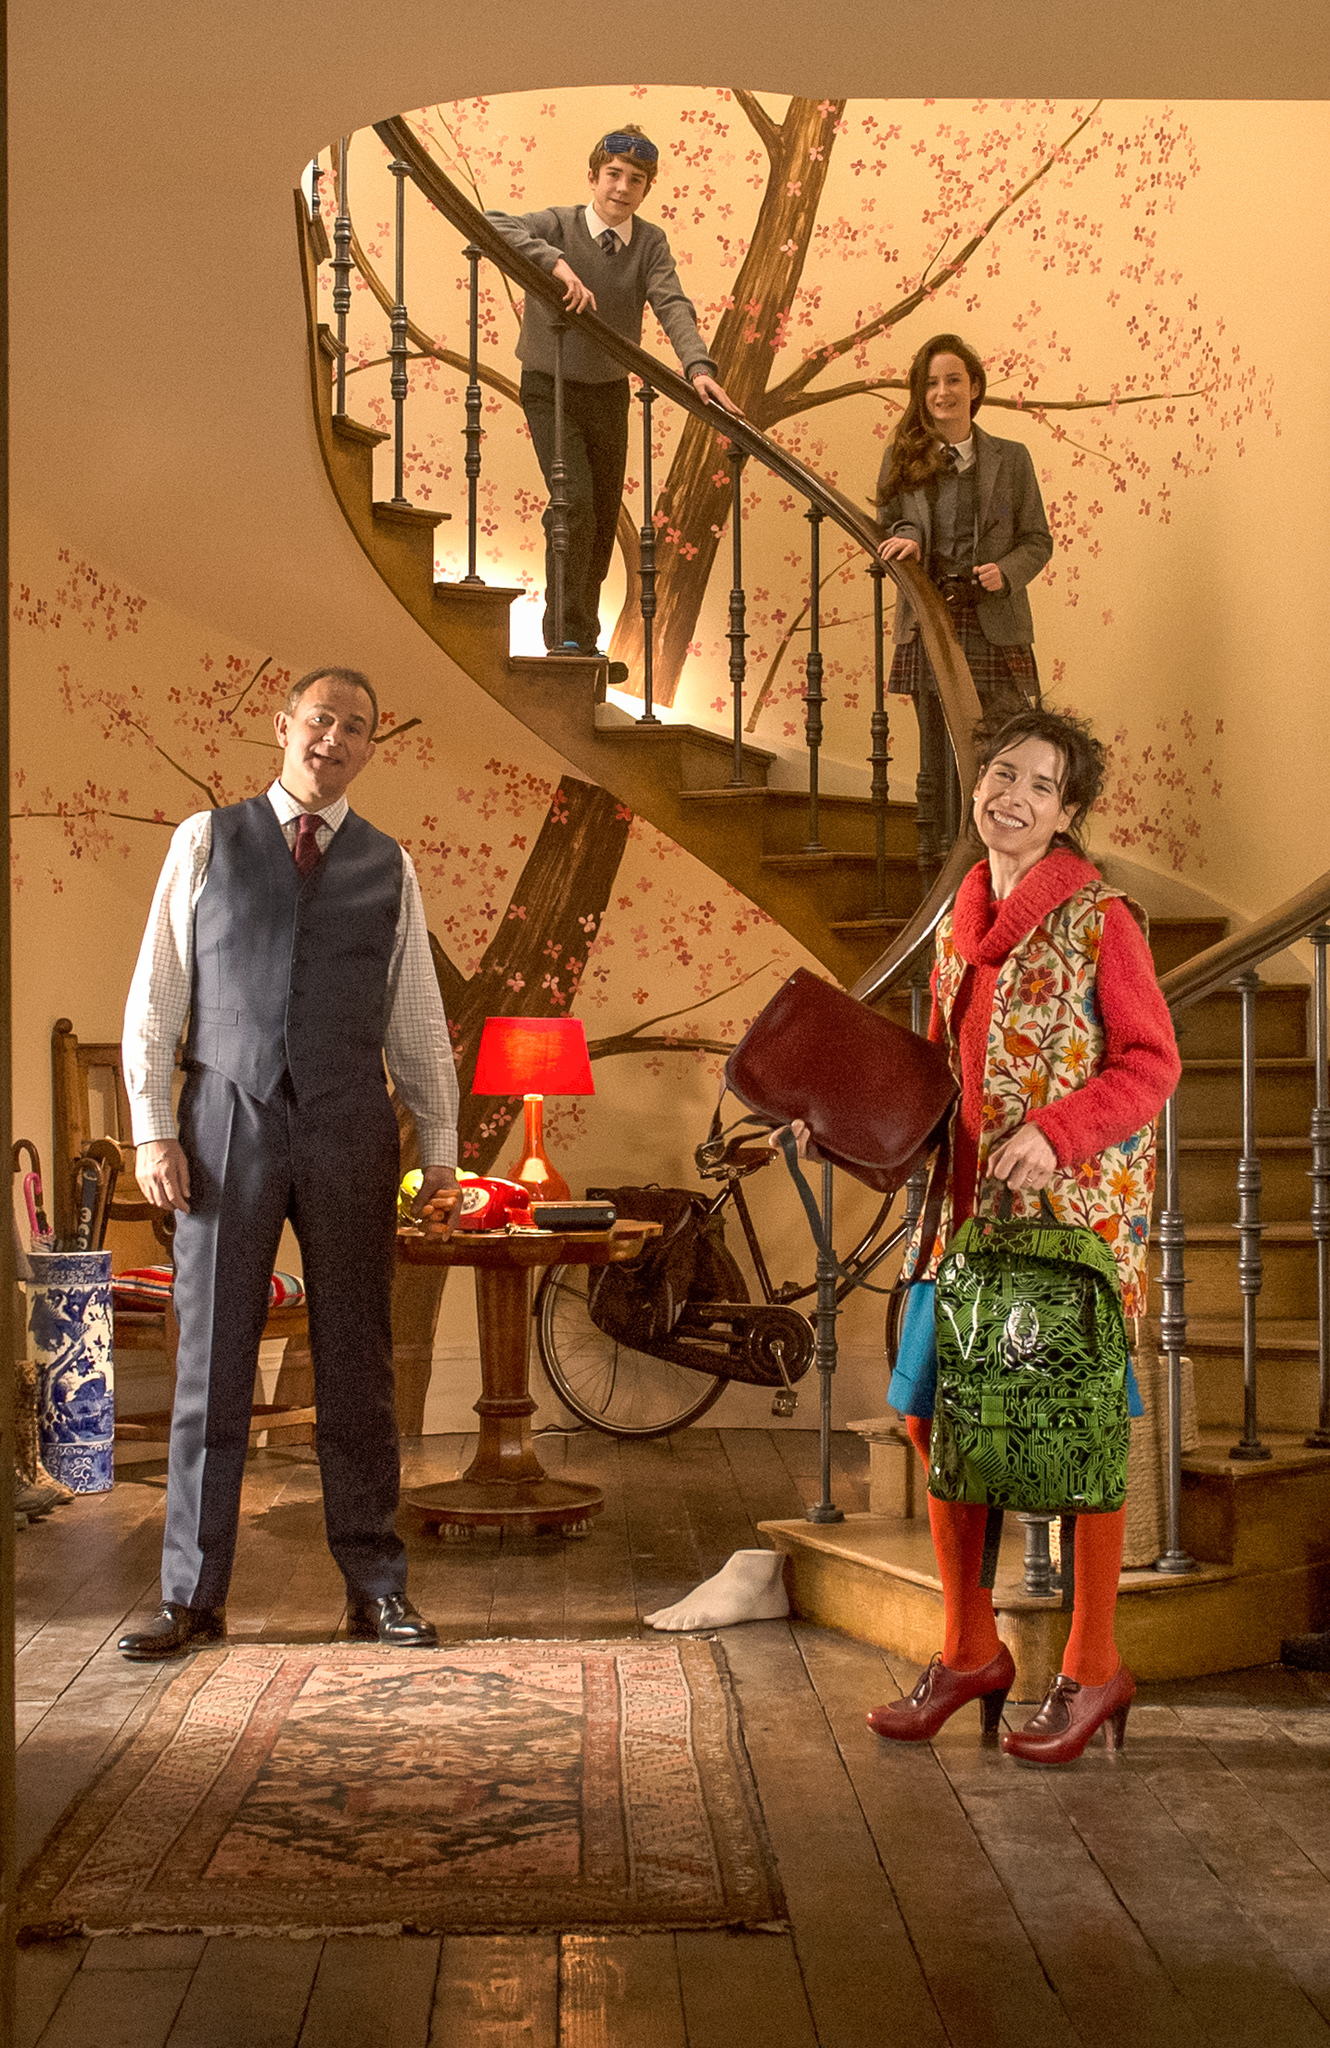 Hugh Bonneville, Sally Hawkins, Madeleine Harris, and Samuel Joslin in Paddington 2 (2017)